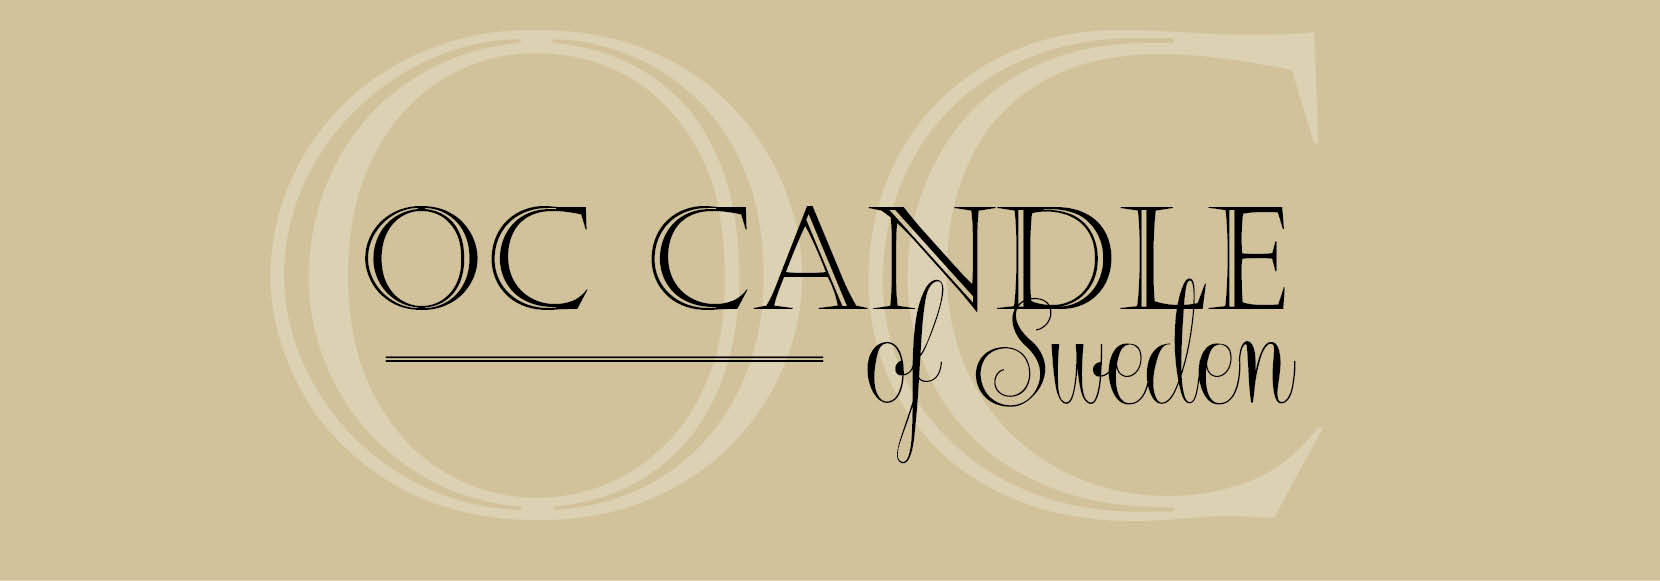 OC Candle logga.jpg